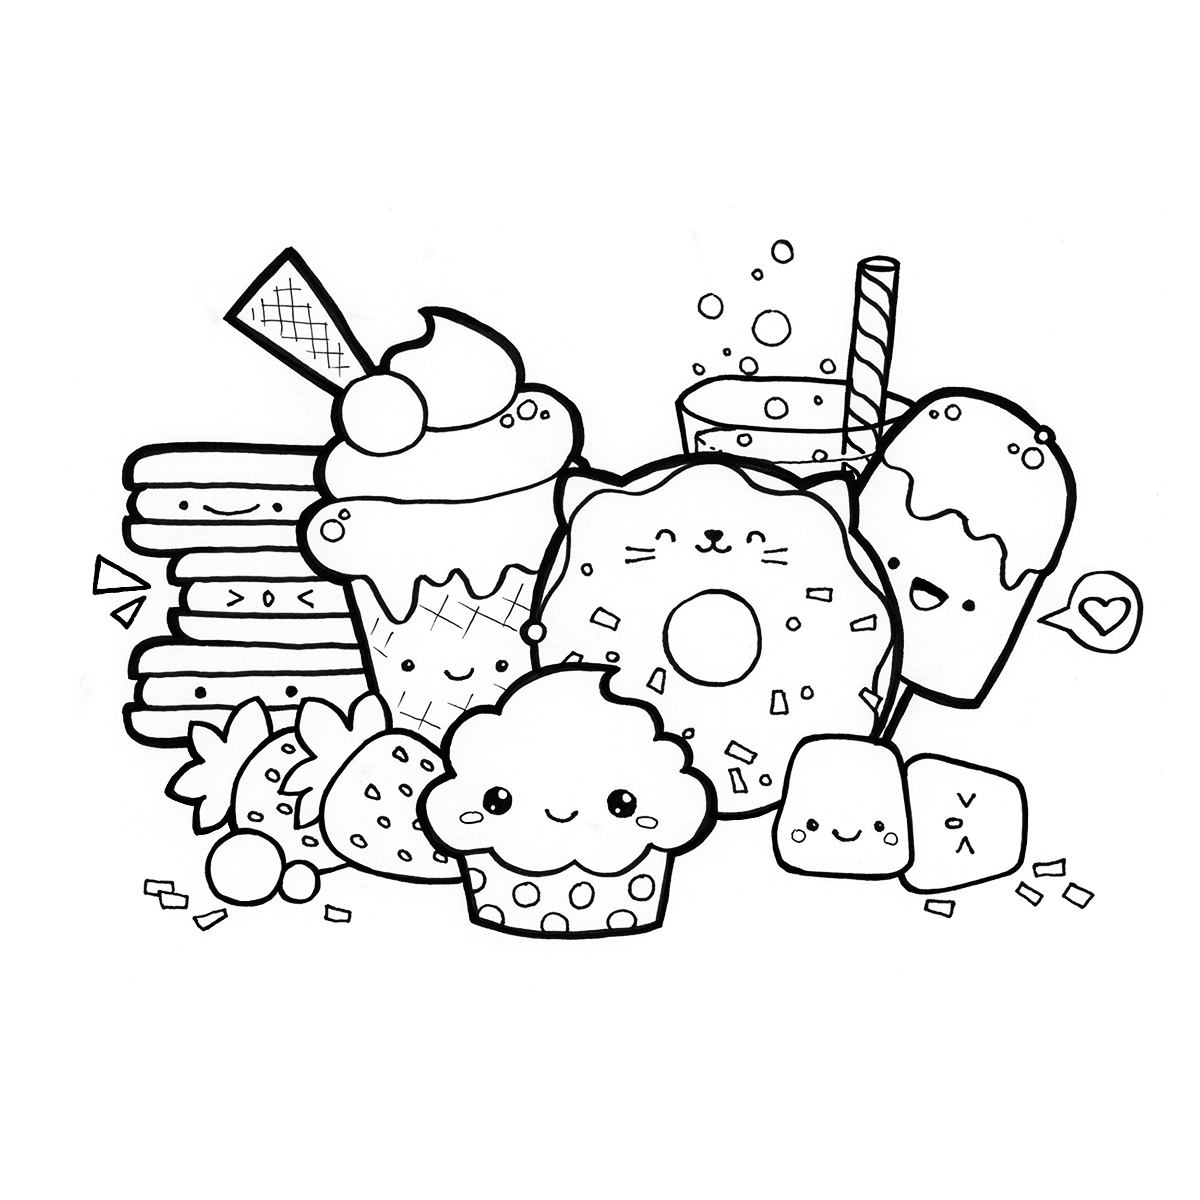 Coloring Pages Kawaii Food : Kawaii doodle food coloring page ★ download pdf at https